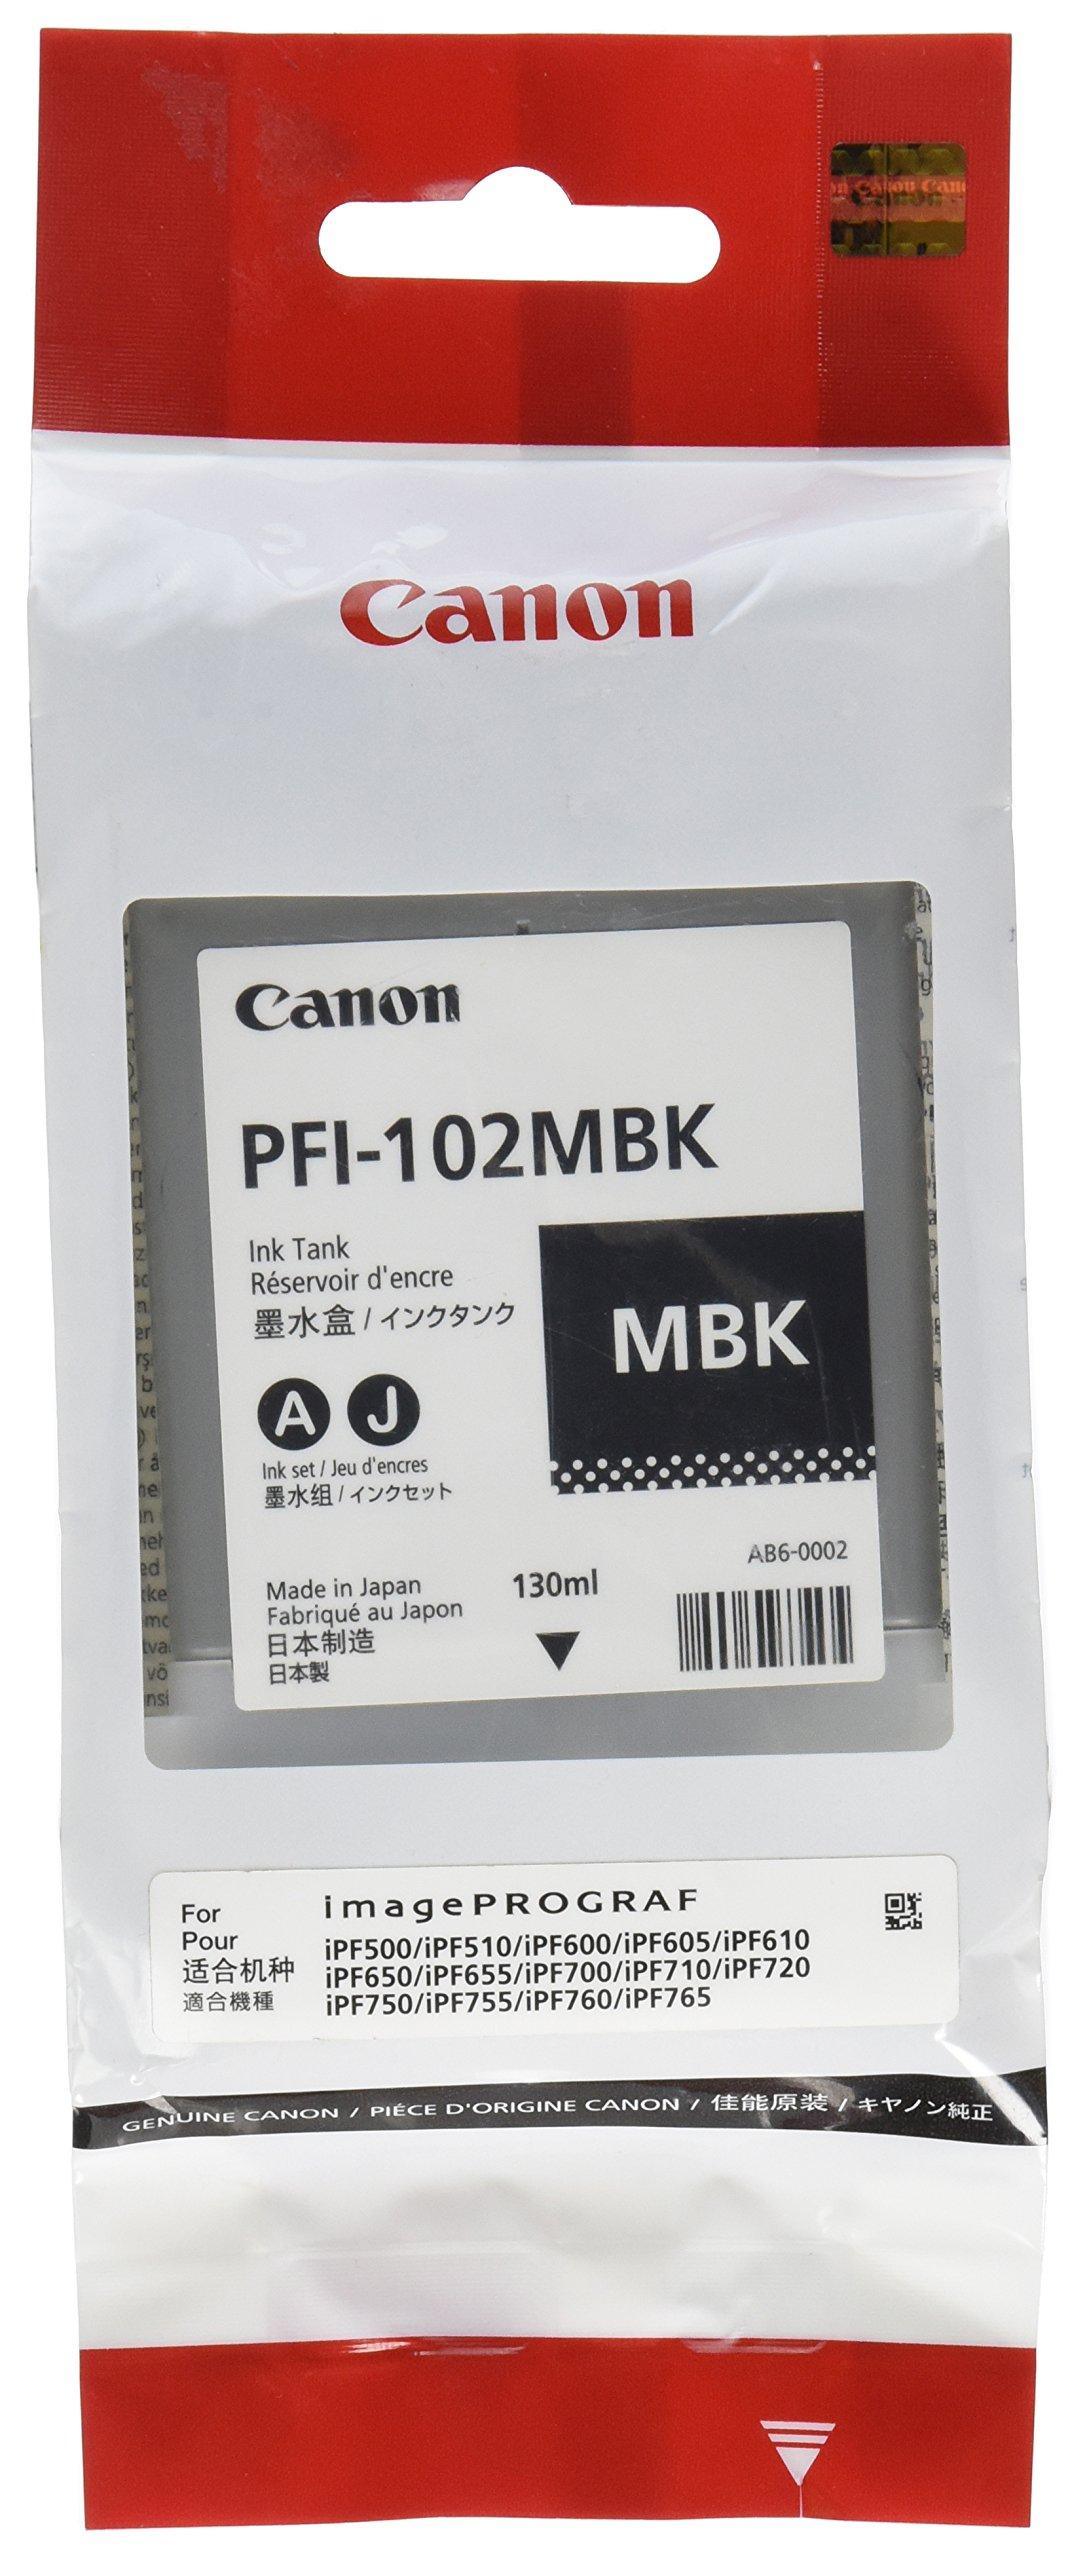 Ipf PFI-102MBK Matte Black Ink Tank 130ML for 500 600 700 Models